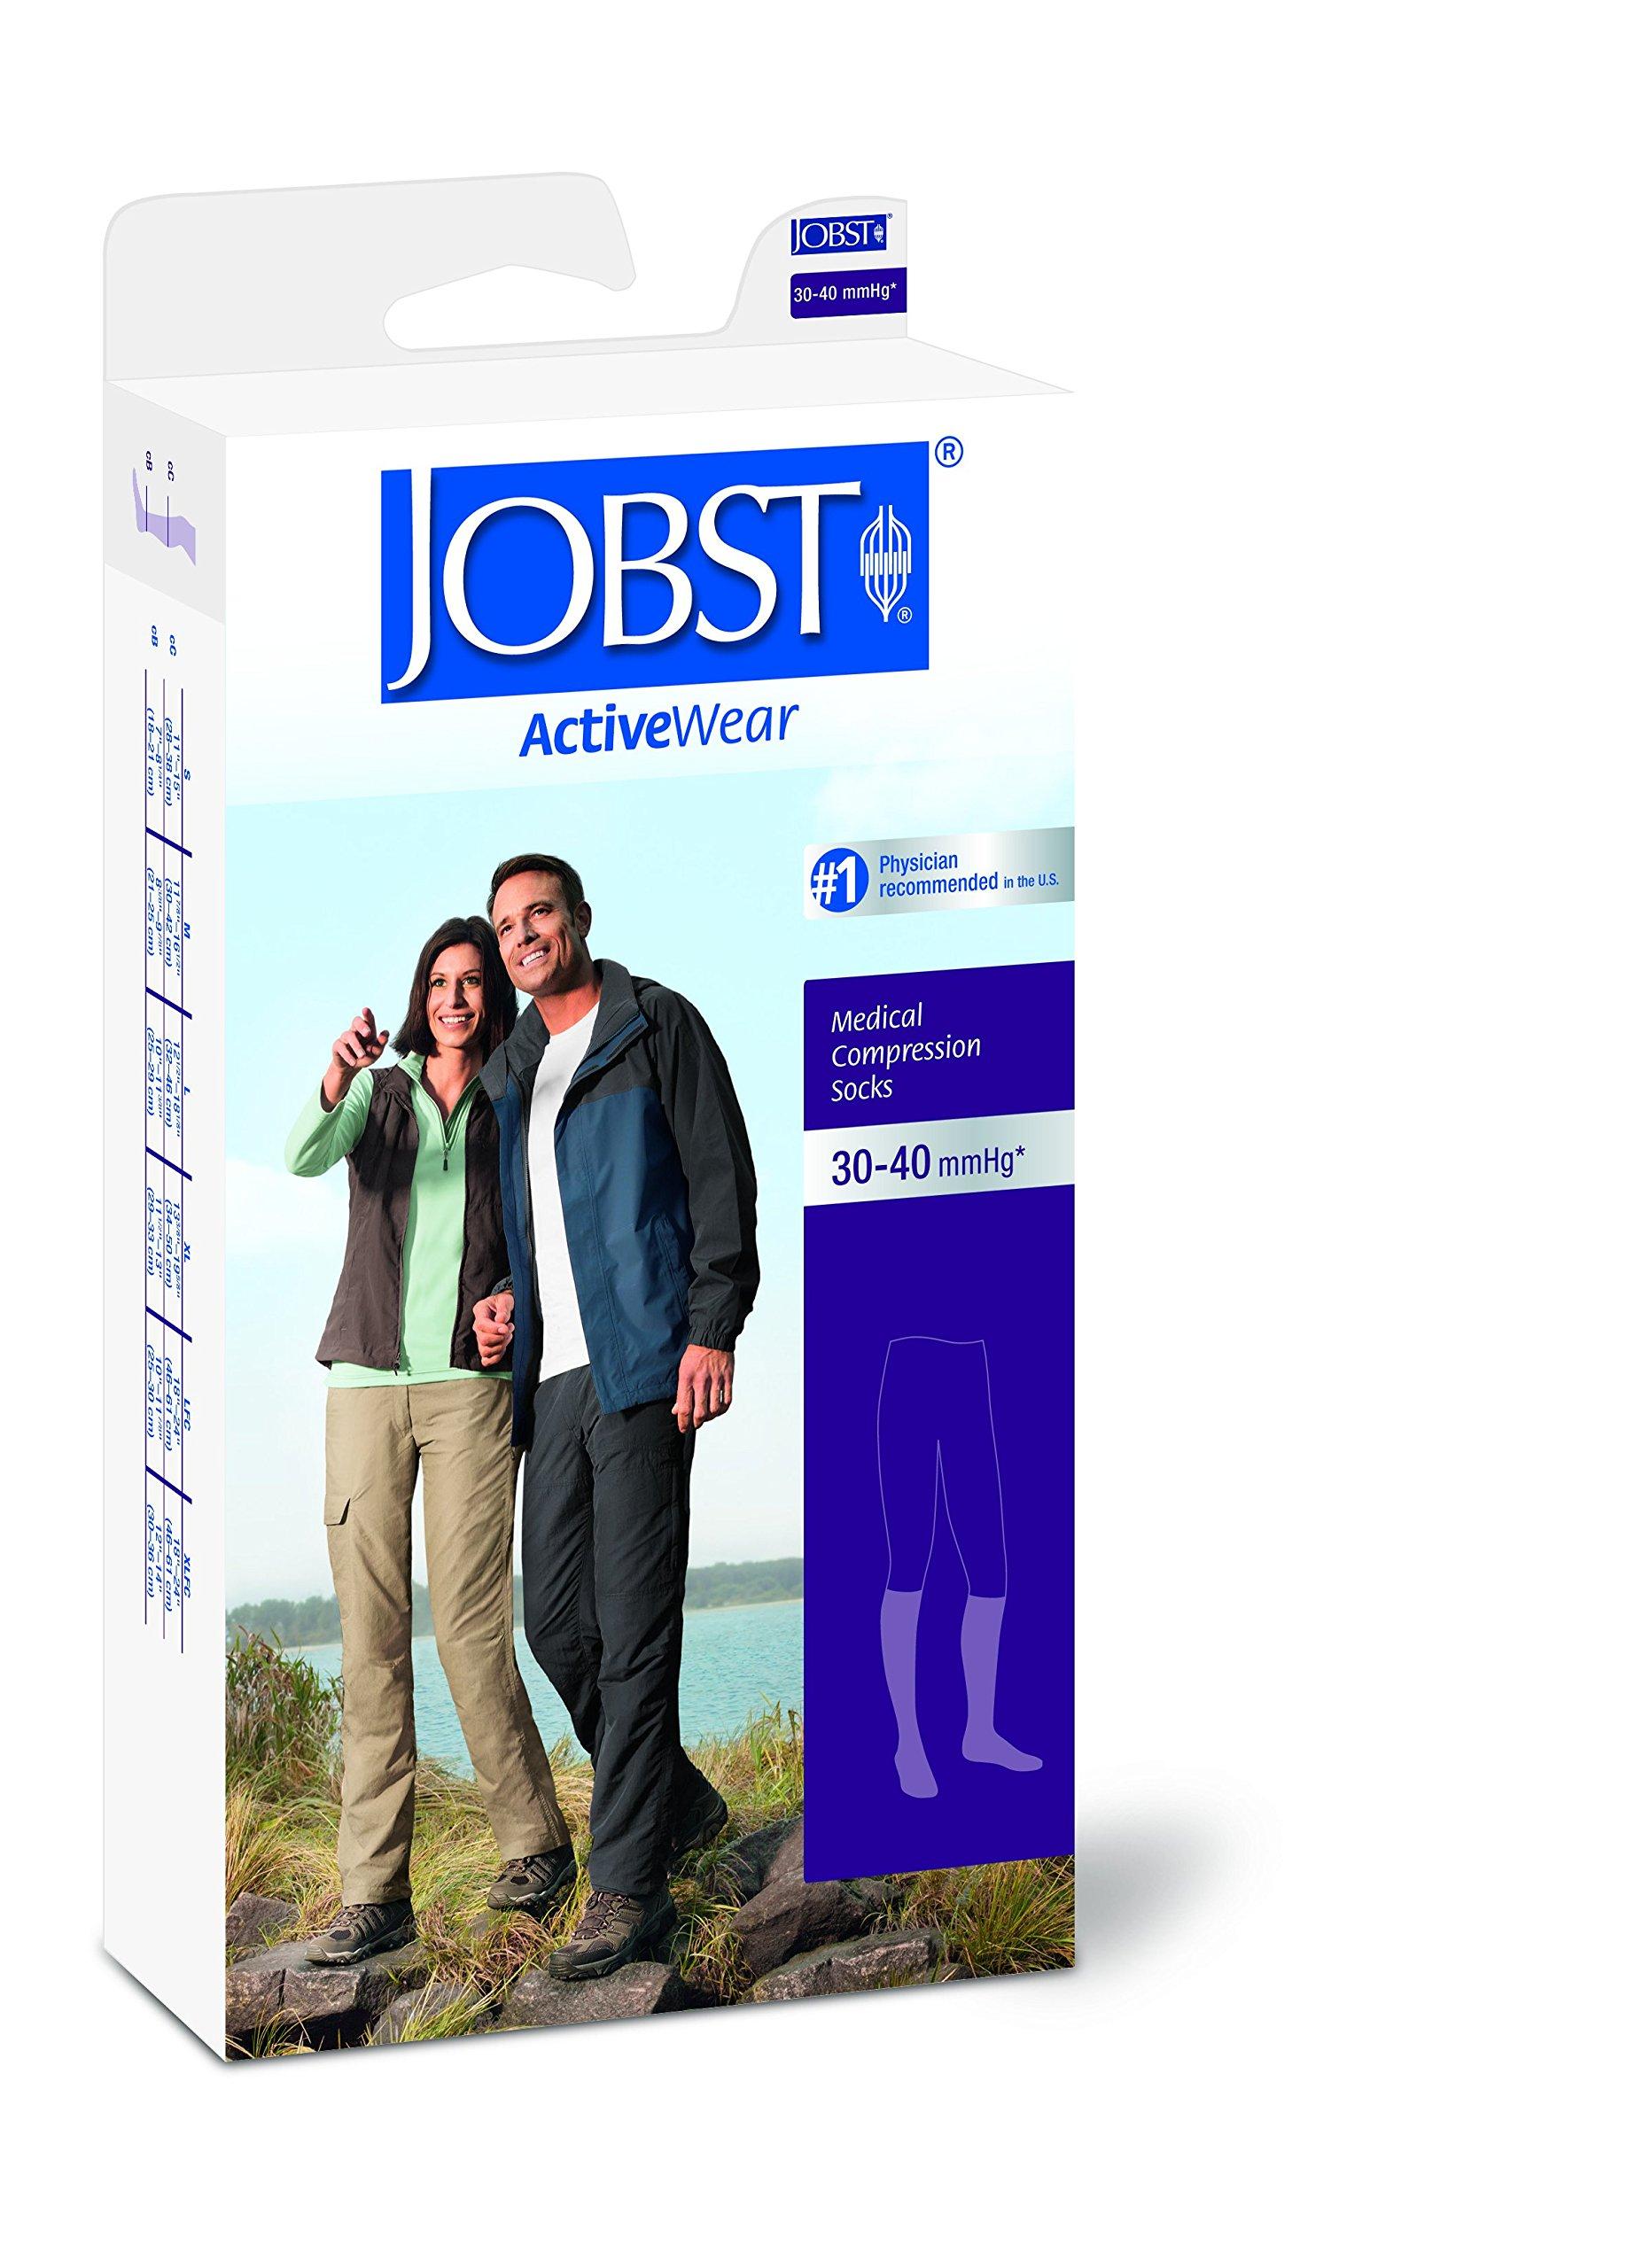 JOBST Activewear 30-40 mmHg Knee High Compression Socks, Medium, Cool White